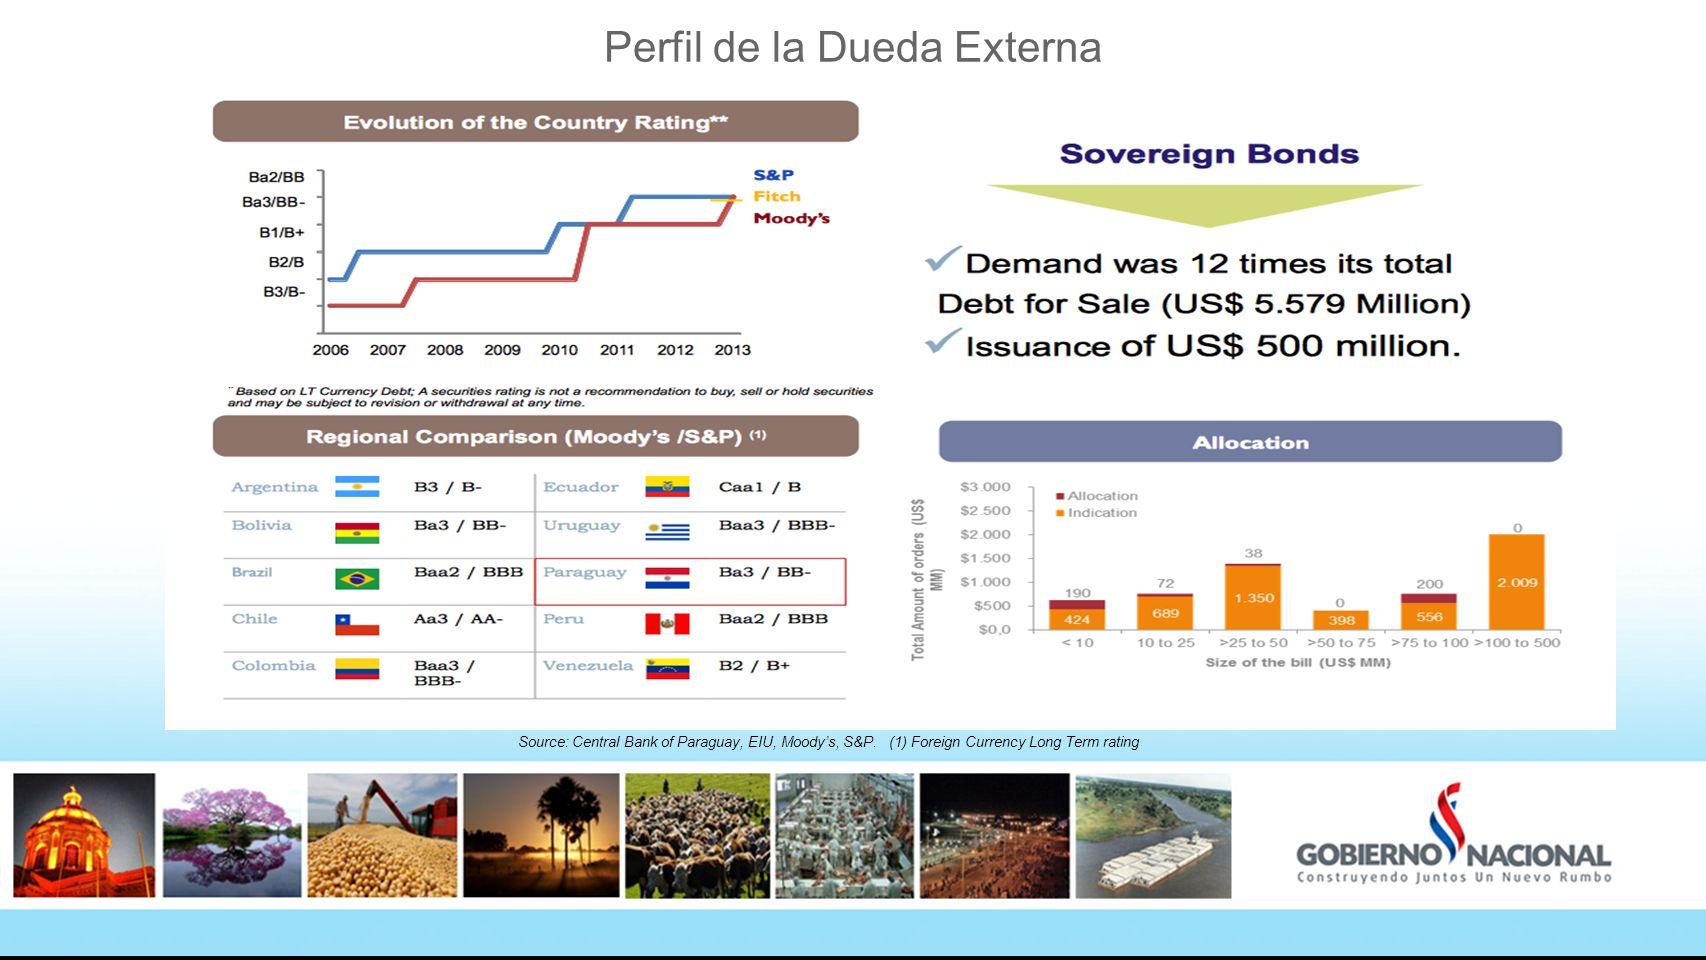 Perfil de la Dueda Externa Source: Central Bank of Paraguay, EIU, Moodys, S&P.